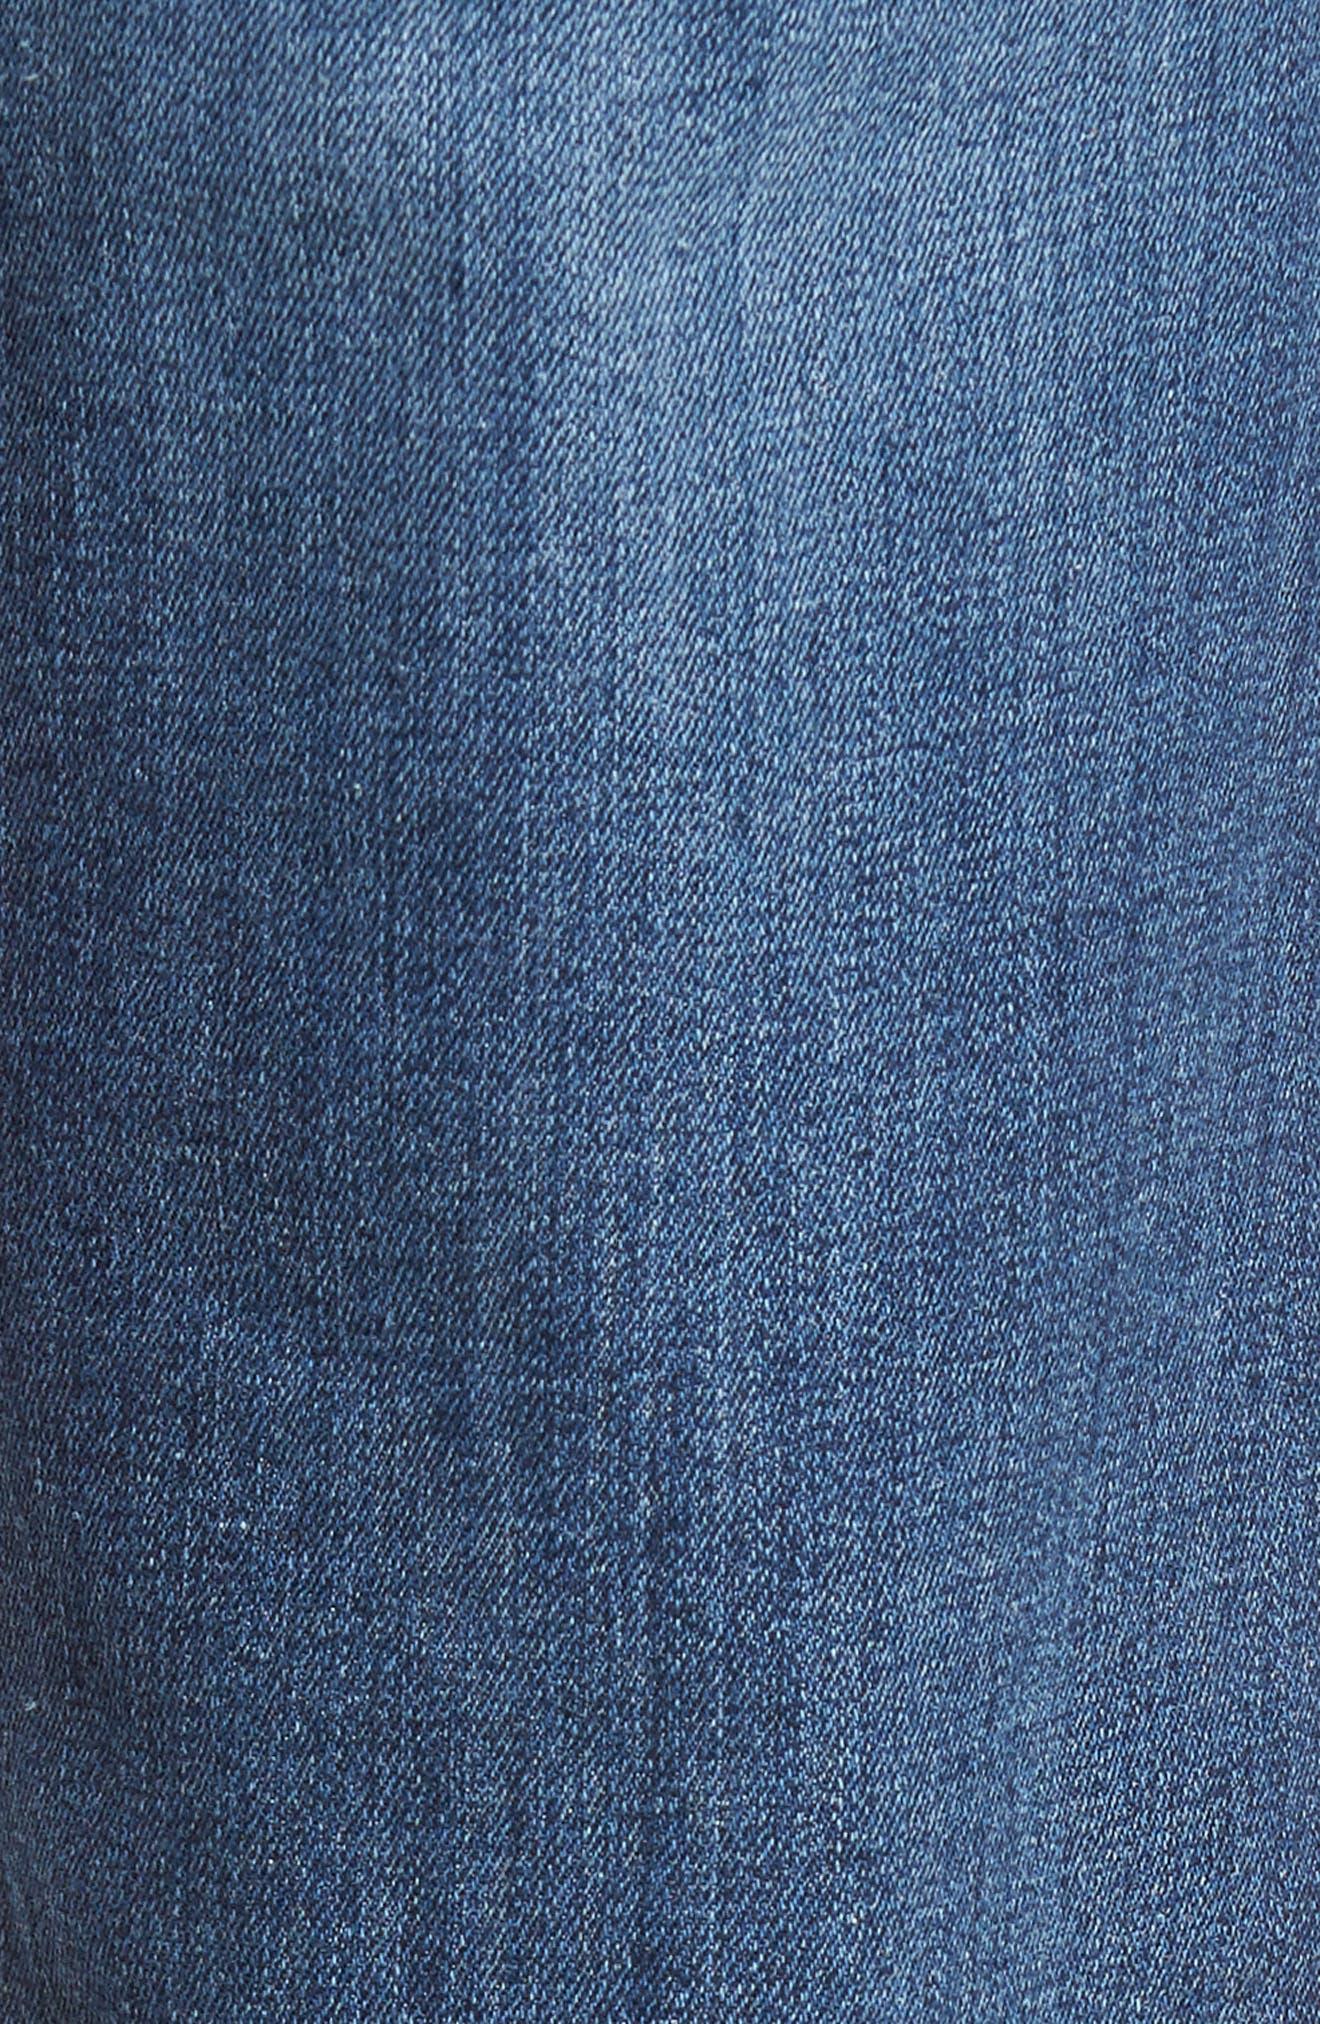 Brixton Slim Straight Leg Jeans,                             Alternate thumbnail 5, color,                             410